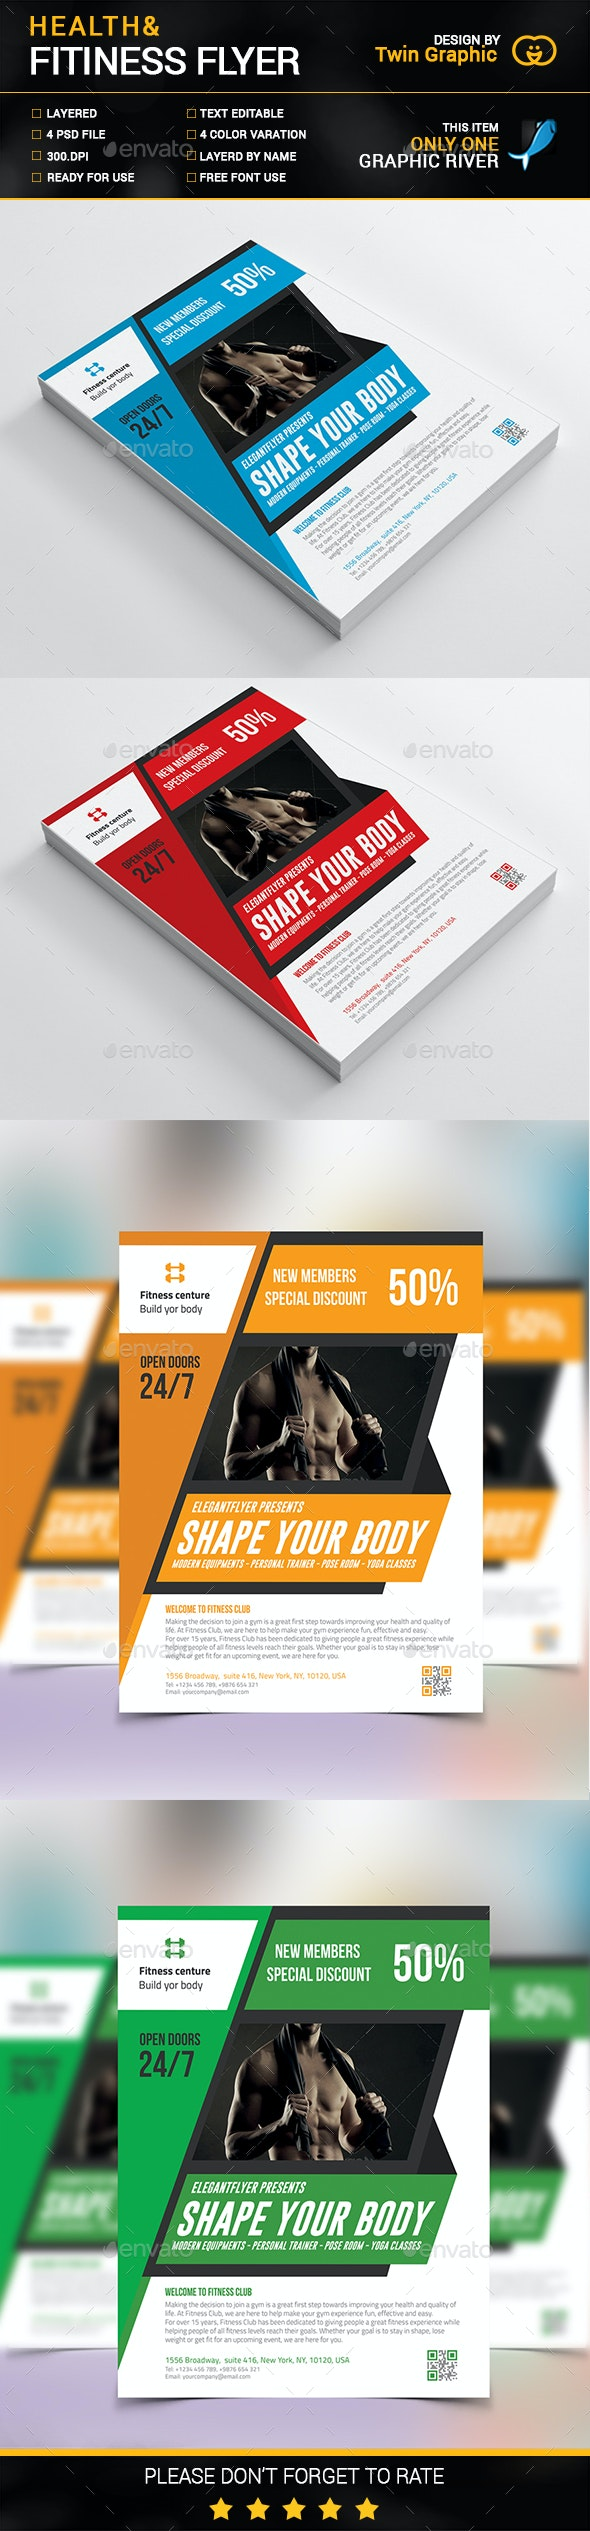 Health & Fitness fitness flyer design. - Flyers Print Templates